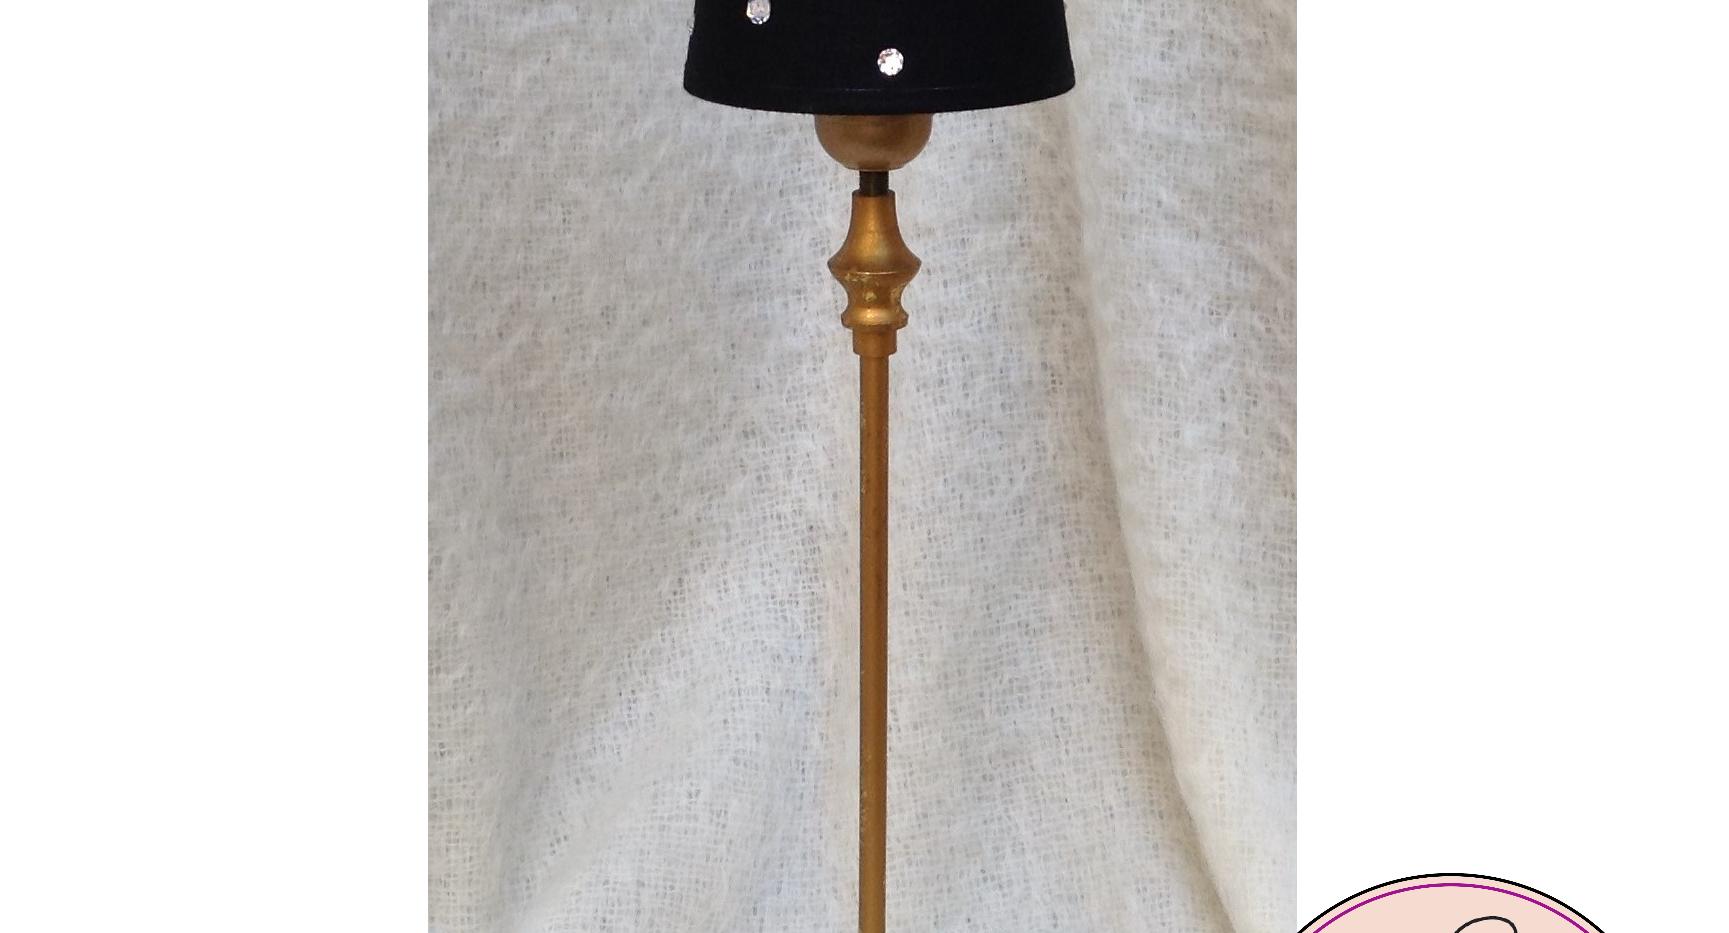 Art Line Tafellamp - zwart-goud met Swar